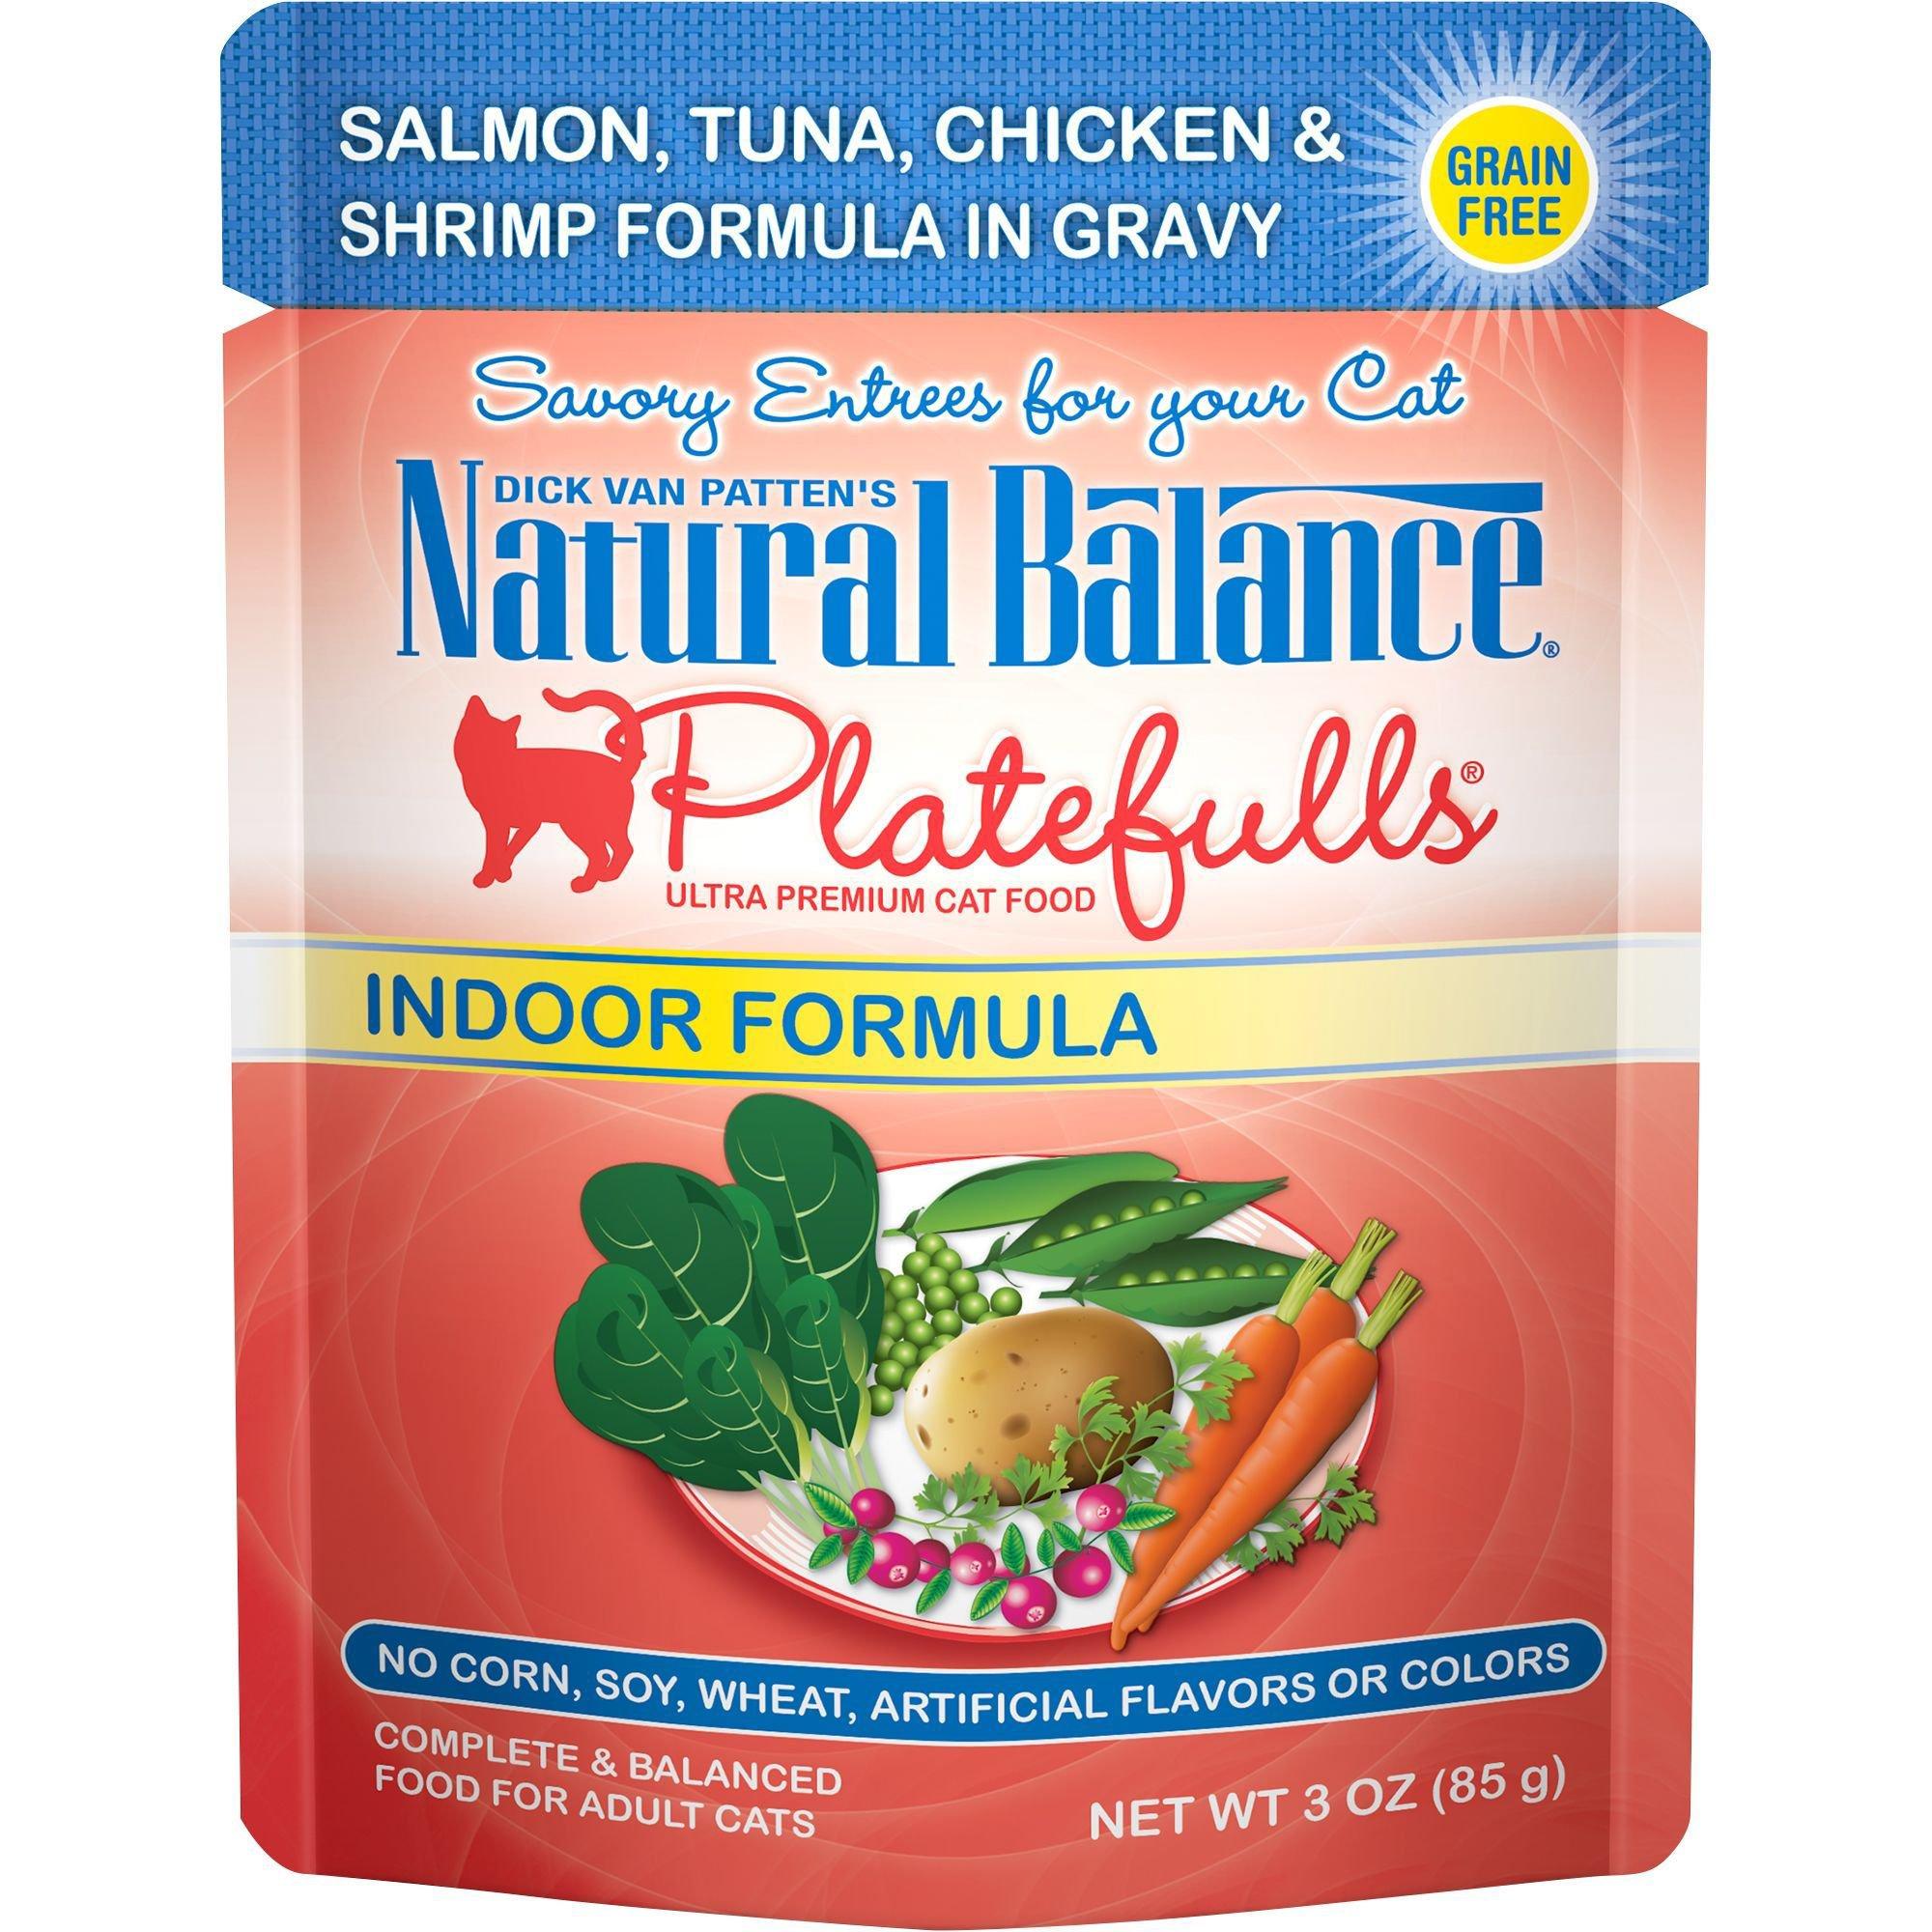 Natural Balance Platefulls Salmon, Tuna, Chicken & Shrimp Indoor Adult Cat Food